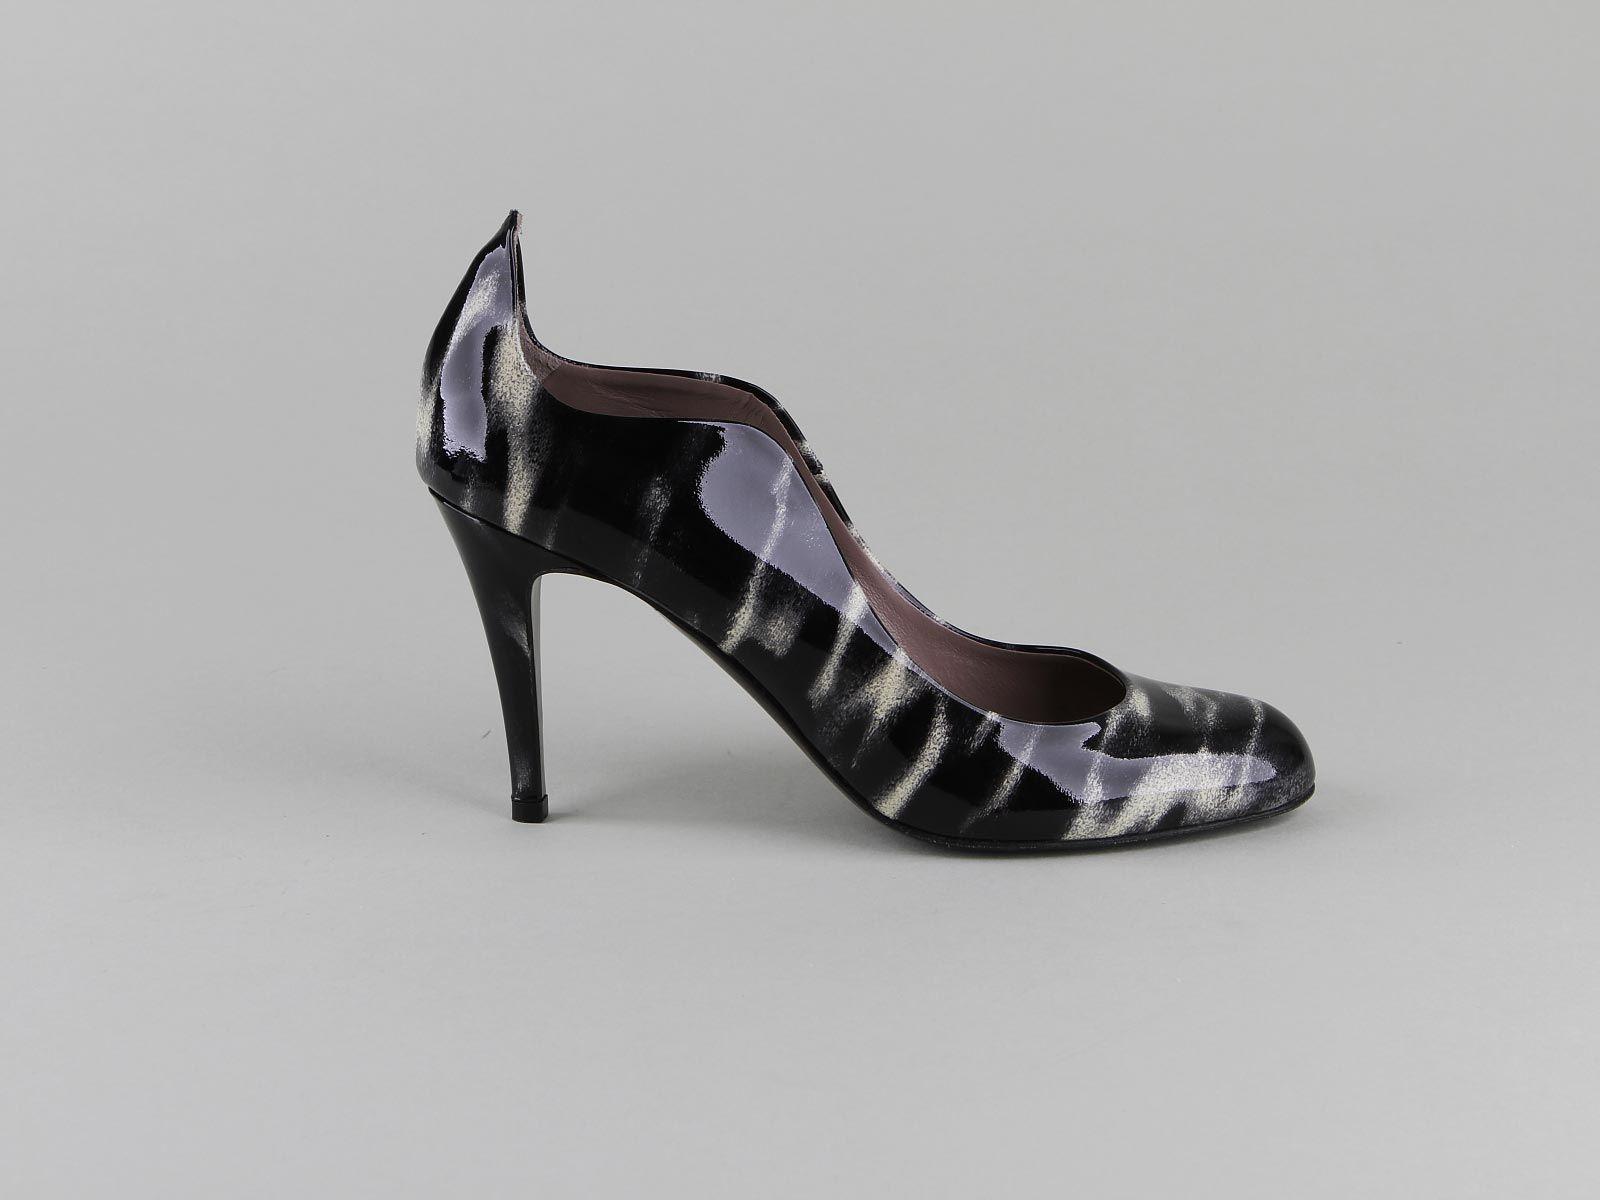 date de sortie: bf408 df491 Apologie SCARLA - Chaussures Femme - Escarpins   Chaussures ...